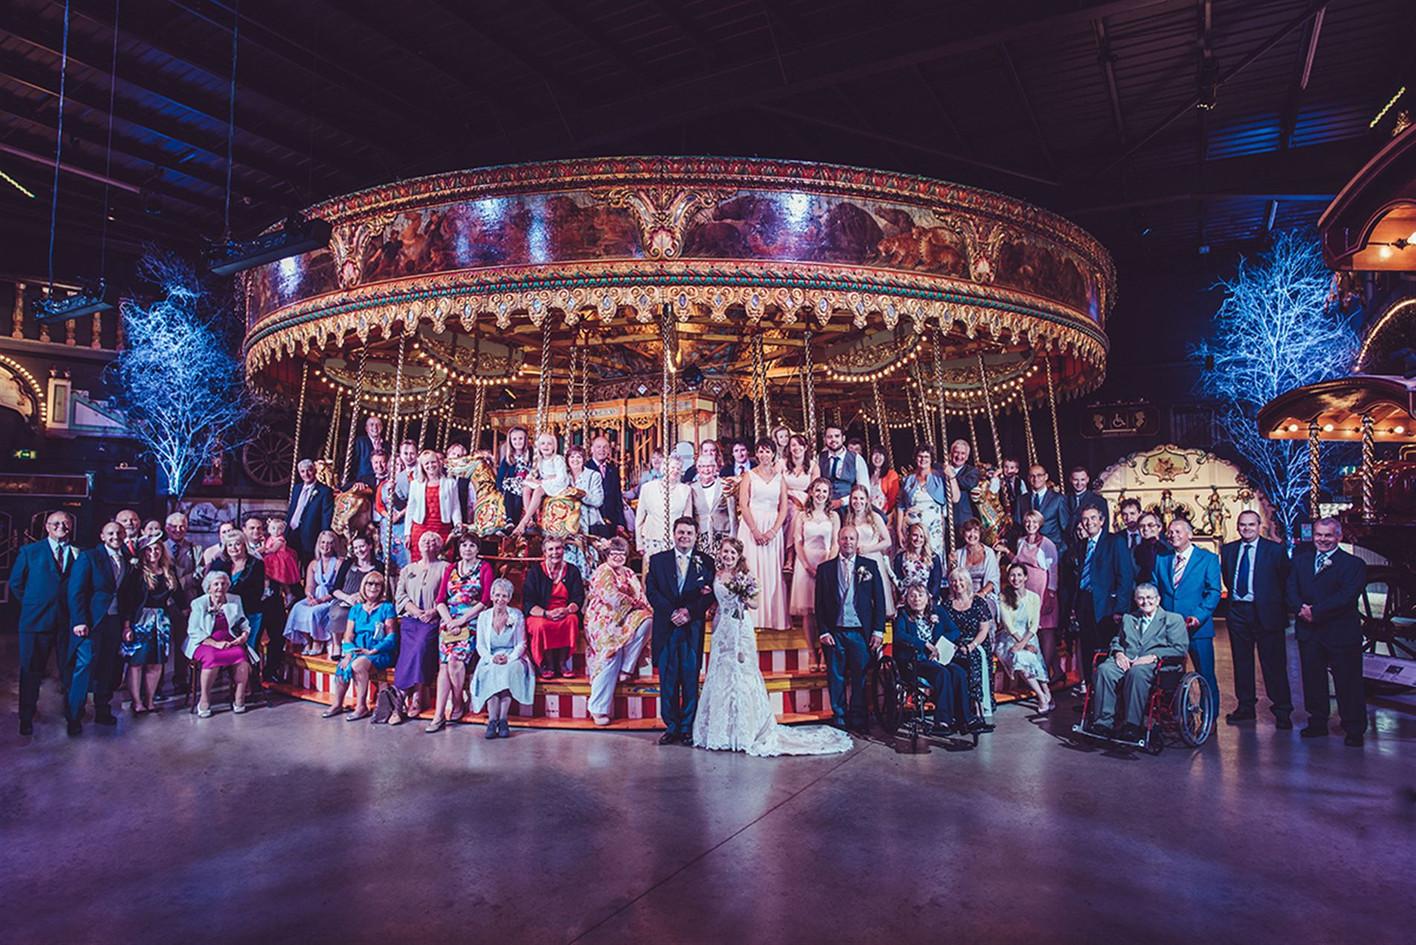 scott-and-lucy-wedding-thursford-by-james-powell-wedding-photographer-norfolk-and-suffolk-016_big.jpg